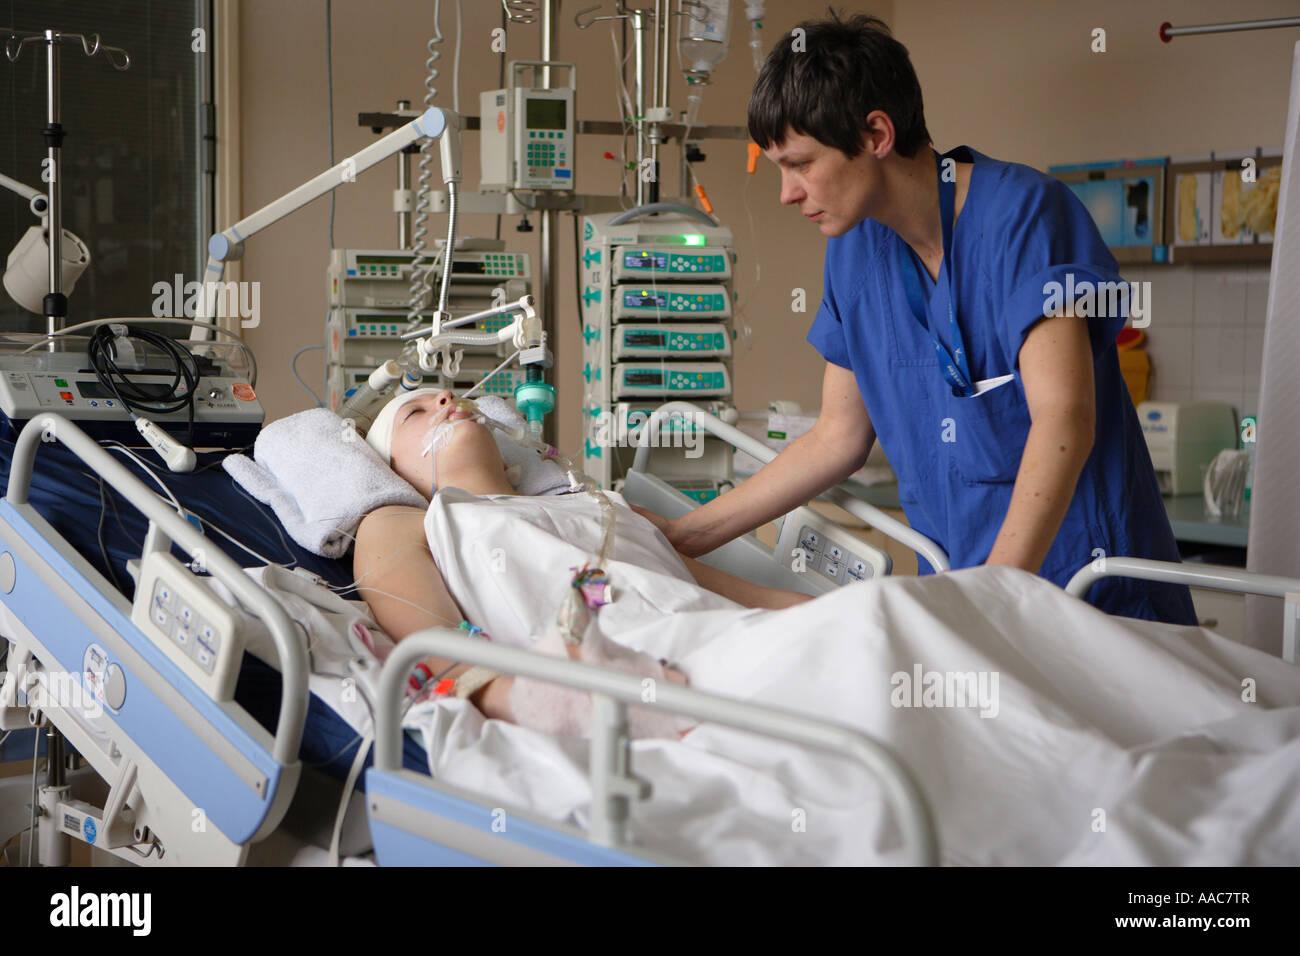 Altona children s hospital Intensive care unit - Stock Image